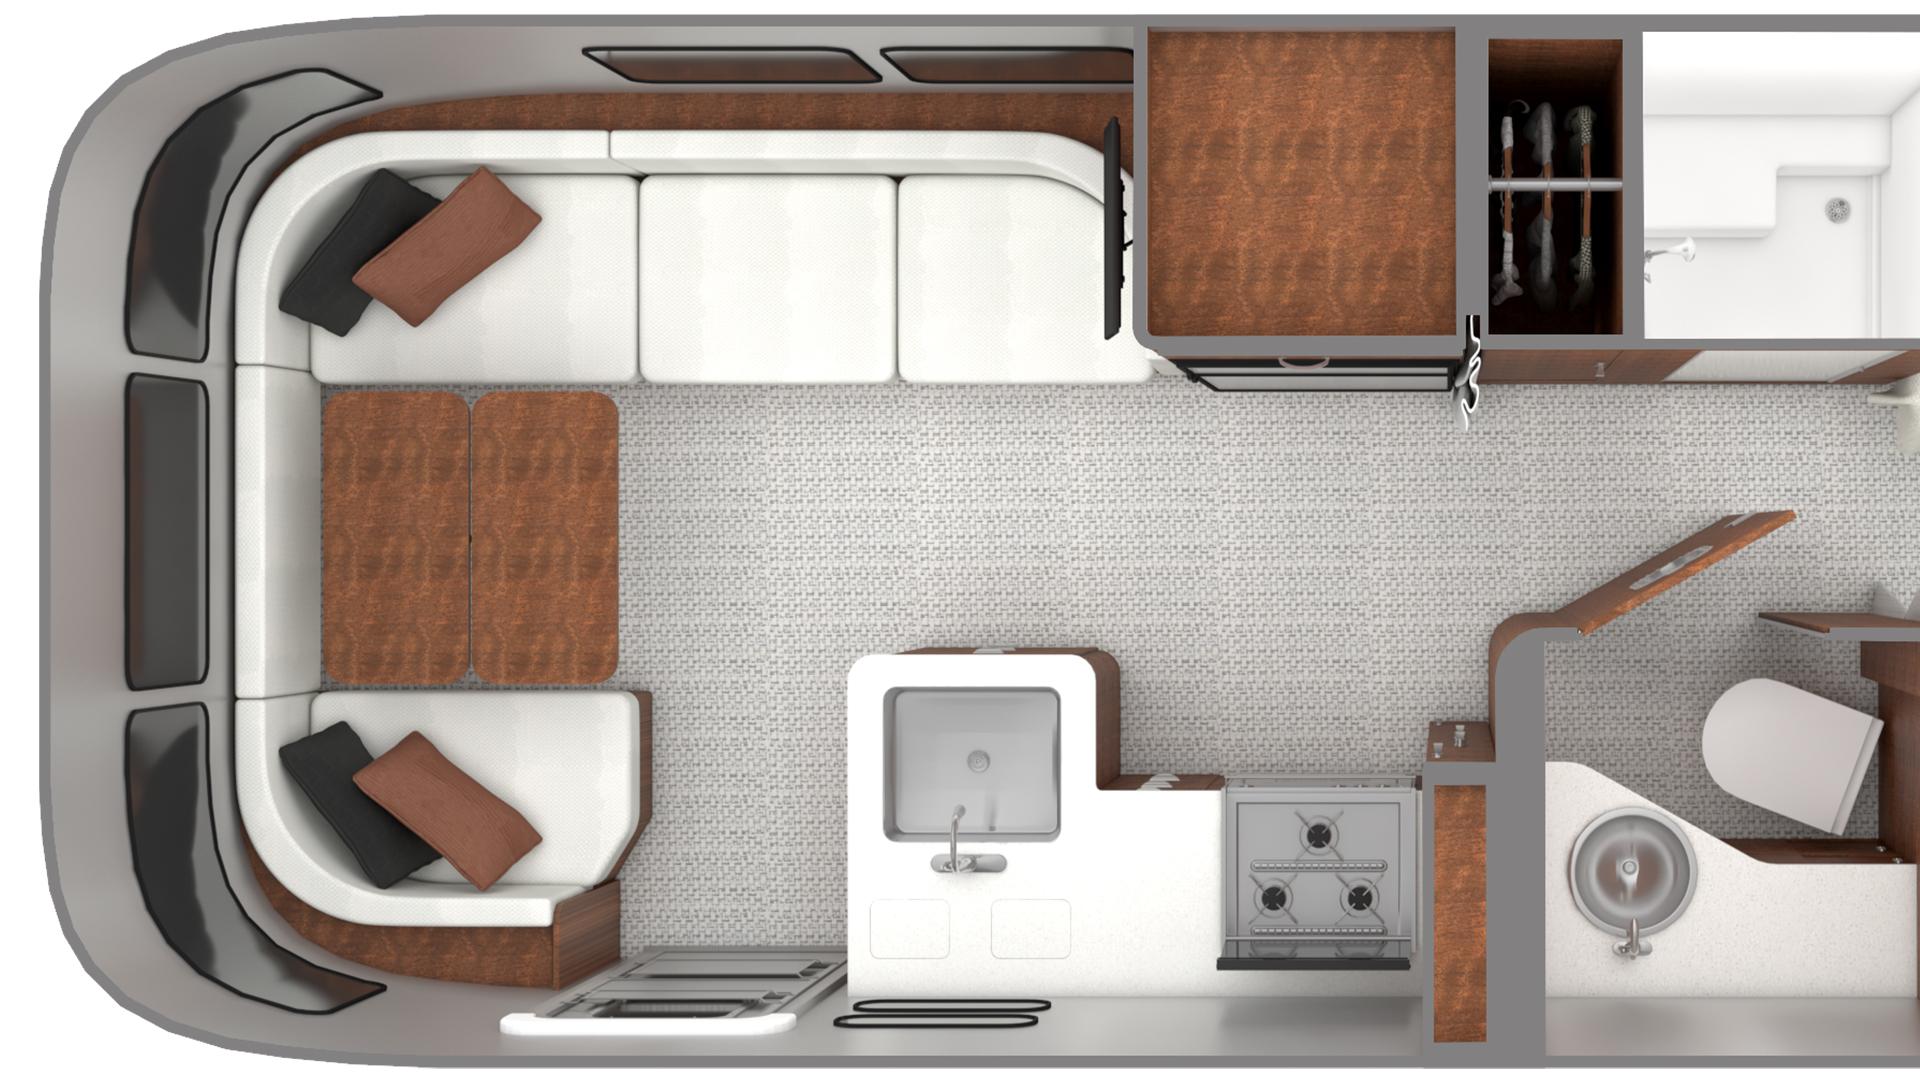 Airstream-Globetrotter-Updated-Dinette-Design